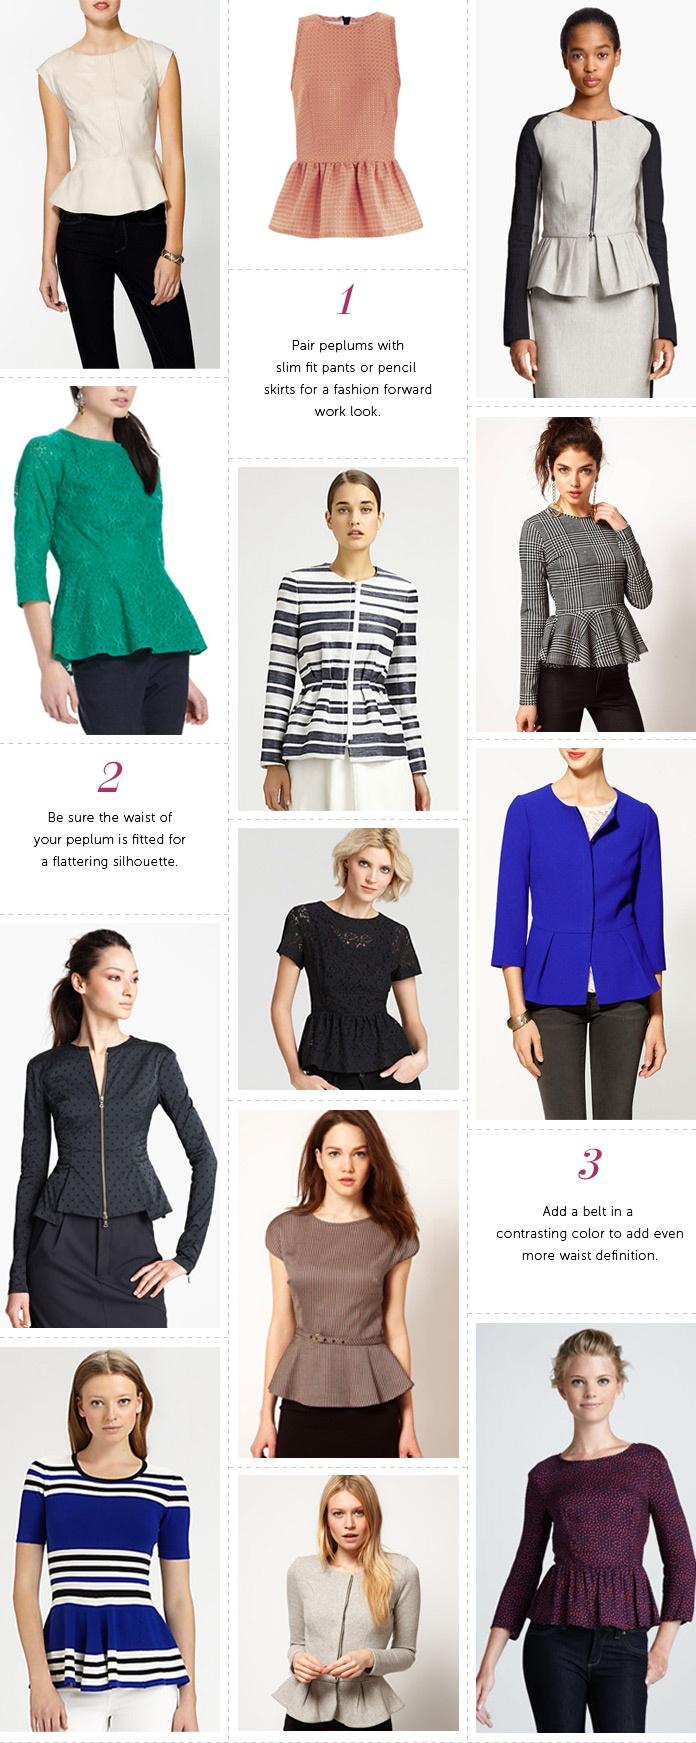 Professionelle: Peplum Tops + Jackets